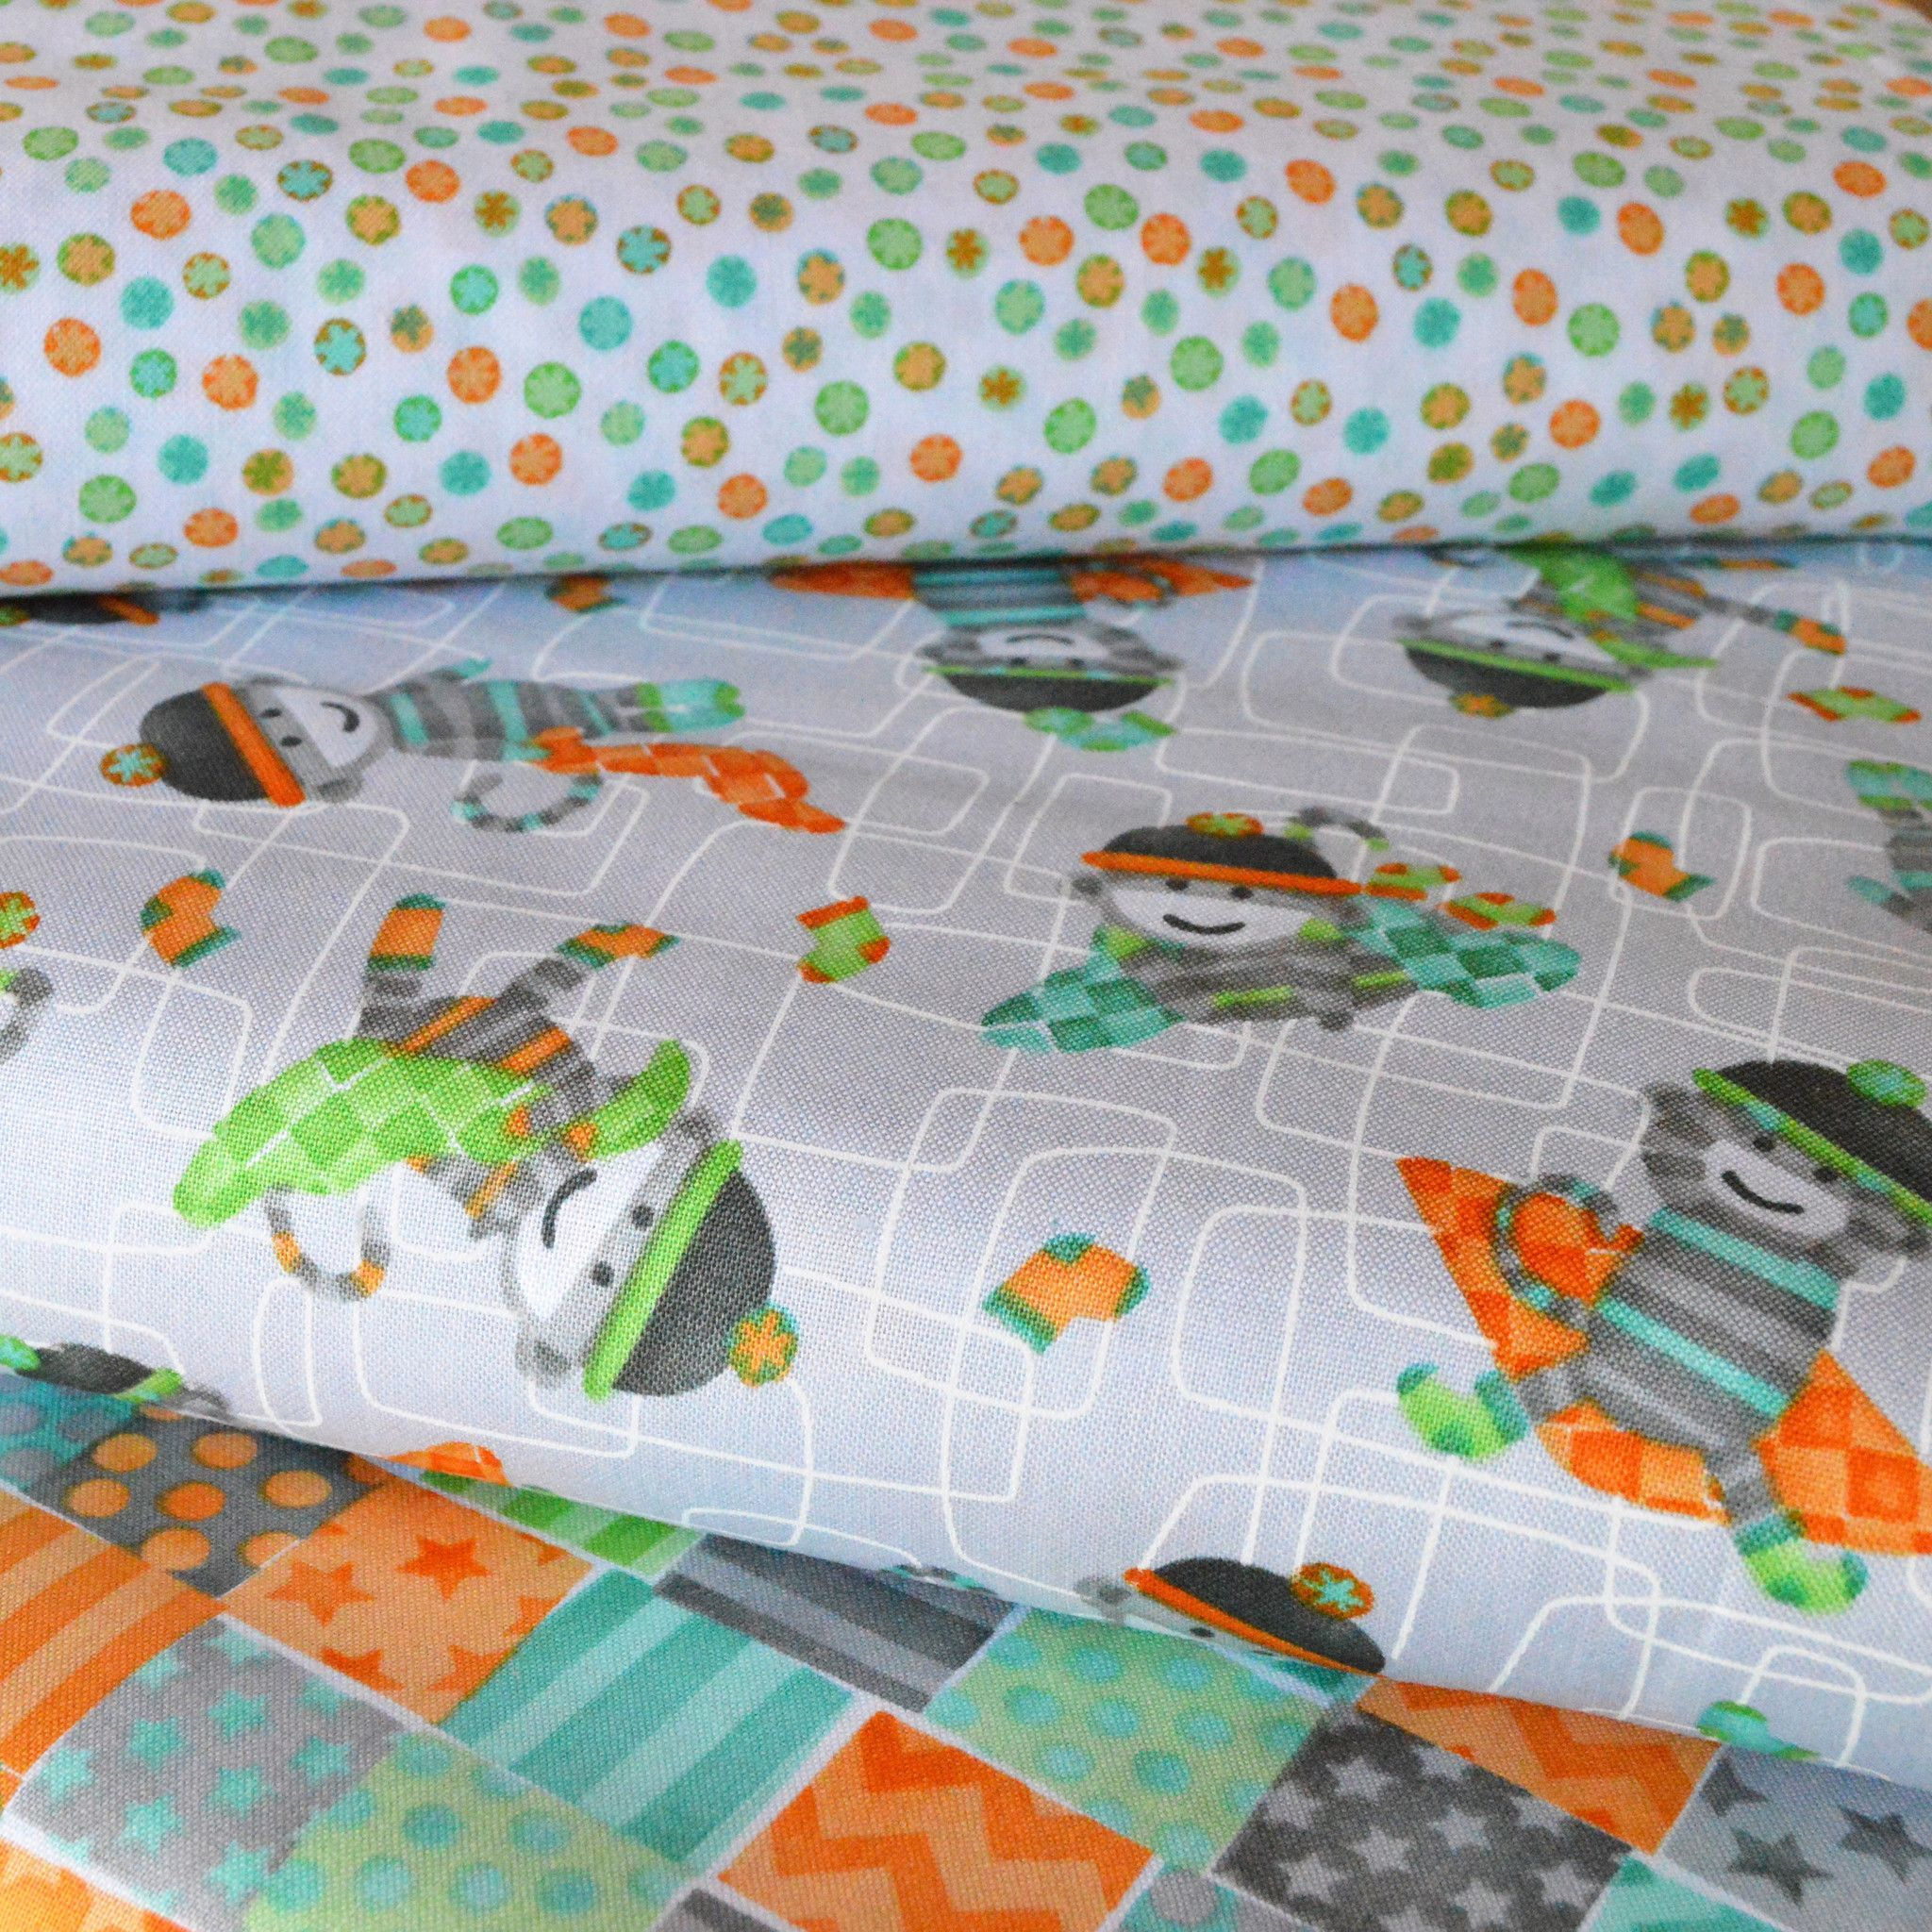 Monkey Business 3 Fabric Bundle at Twisted Tree Fabric